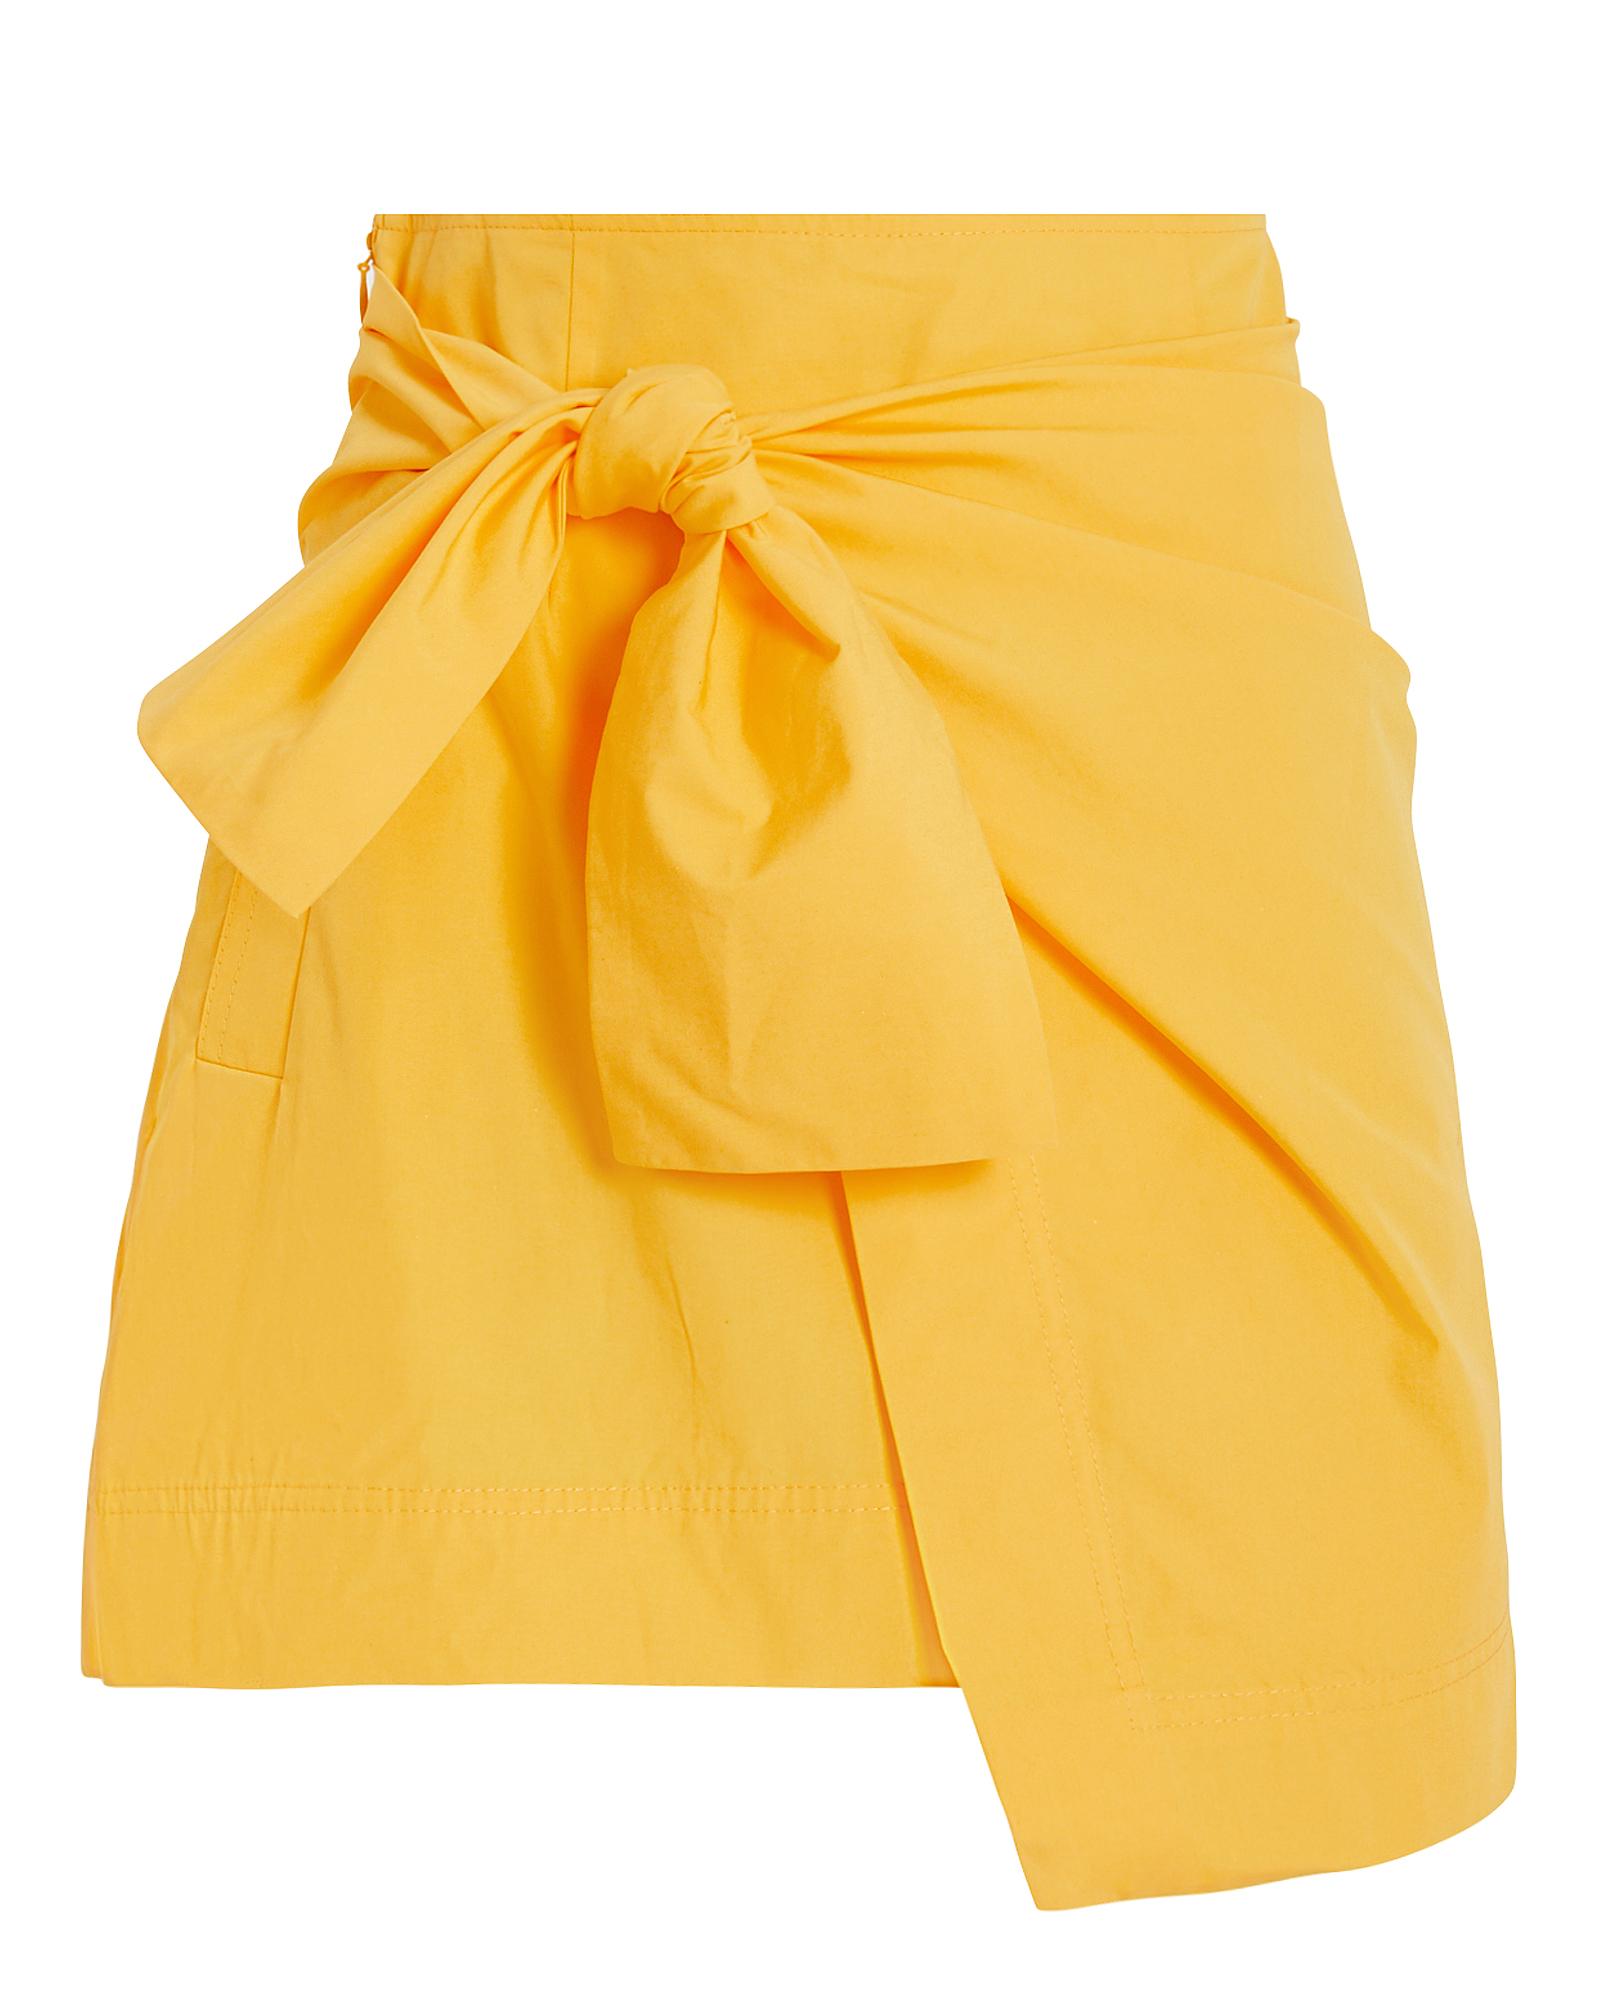 Derek Lam 10 Crosby Skirts DEREK LAM 10 CROSBY KNOTTED WRAP MINI SKIRT  YELLOW 6